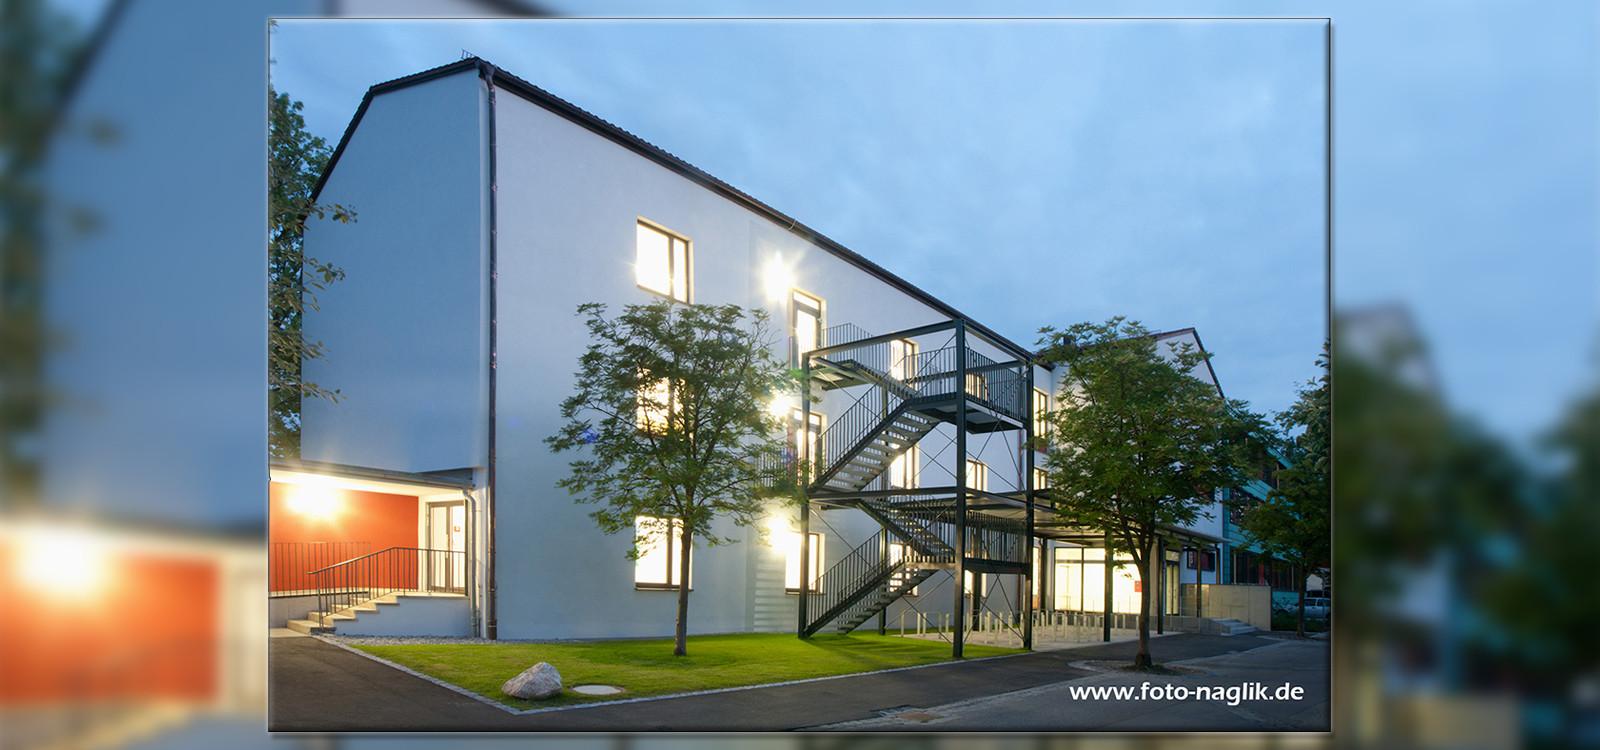 Naglik-Foto-Erding-Architektur-12 Kopie